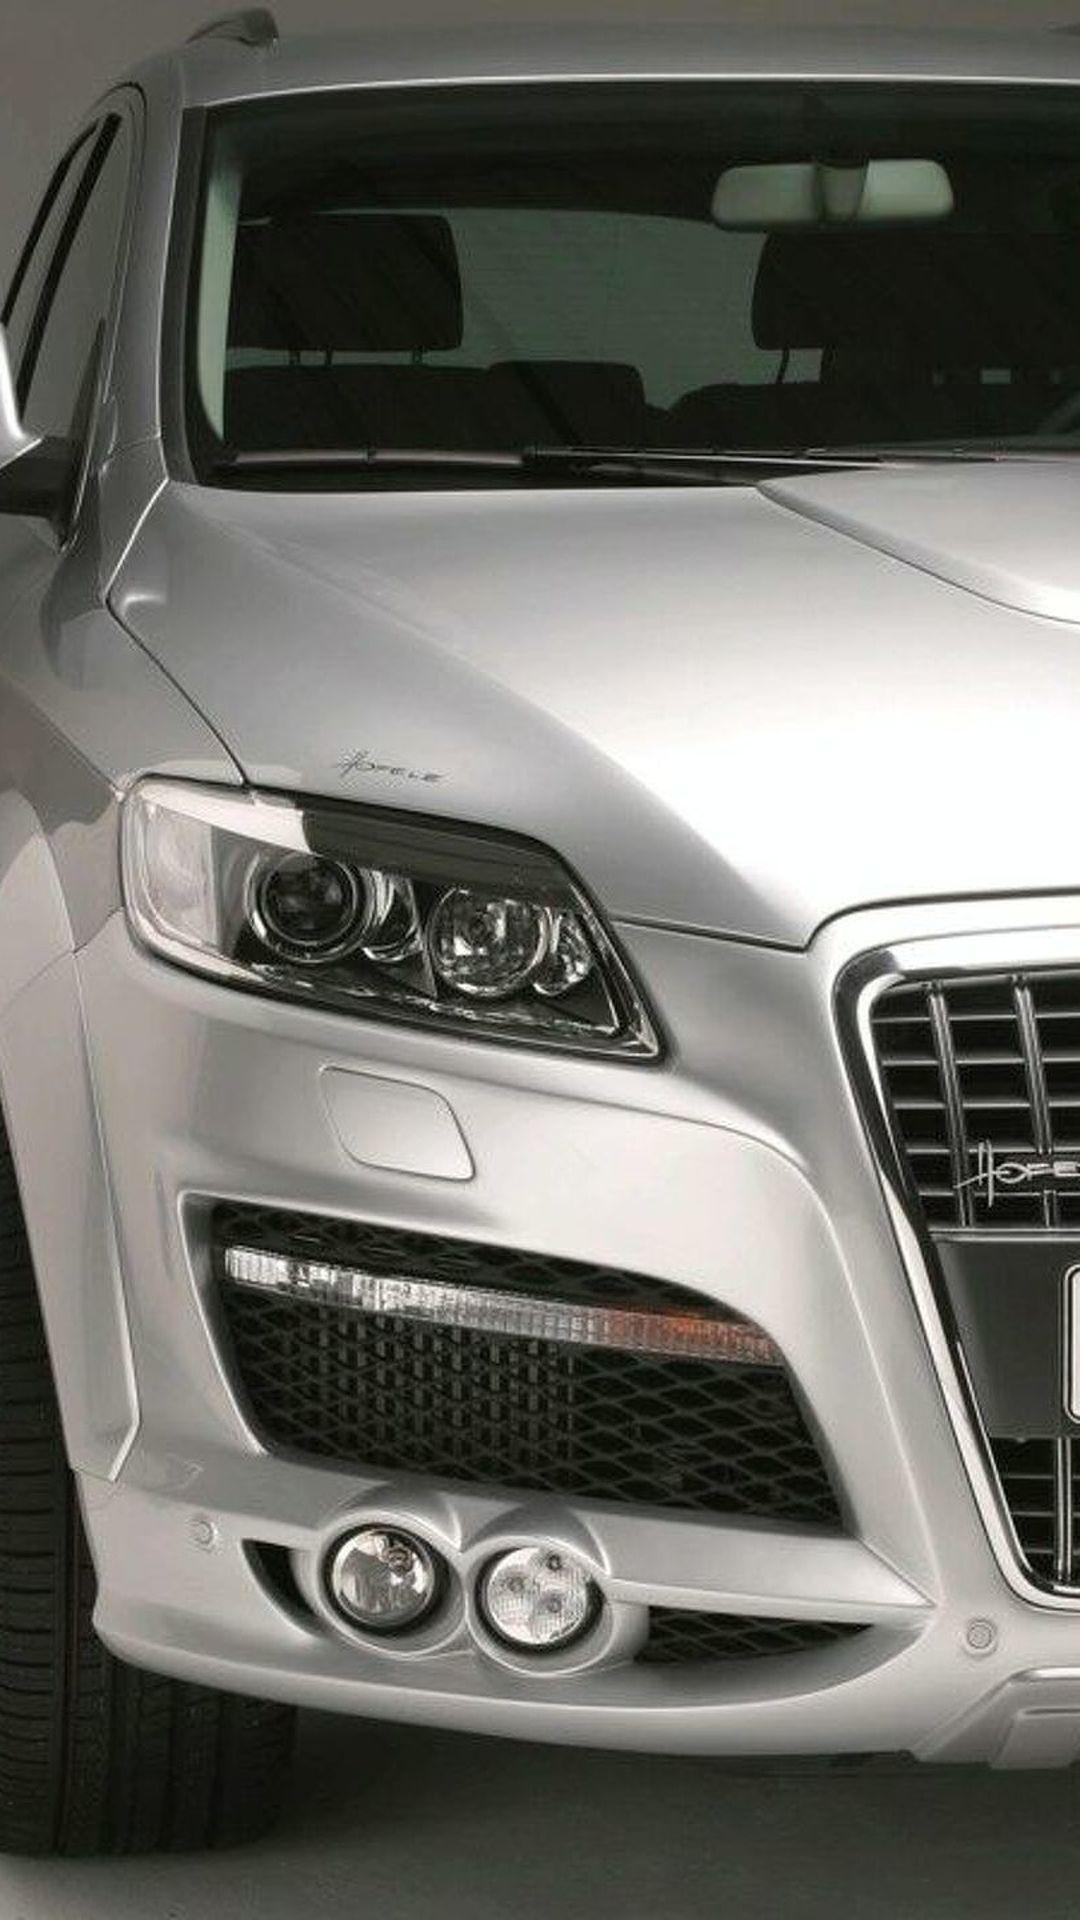 How To Pronounce Audi >> Hofele Design Releases Audi Q7 Tuning Kit